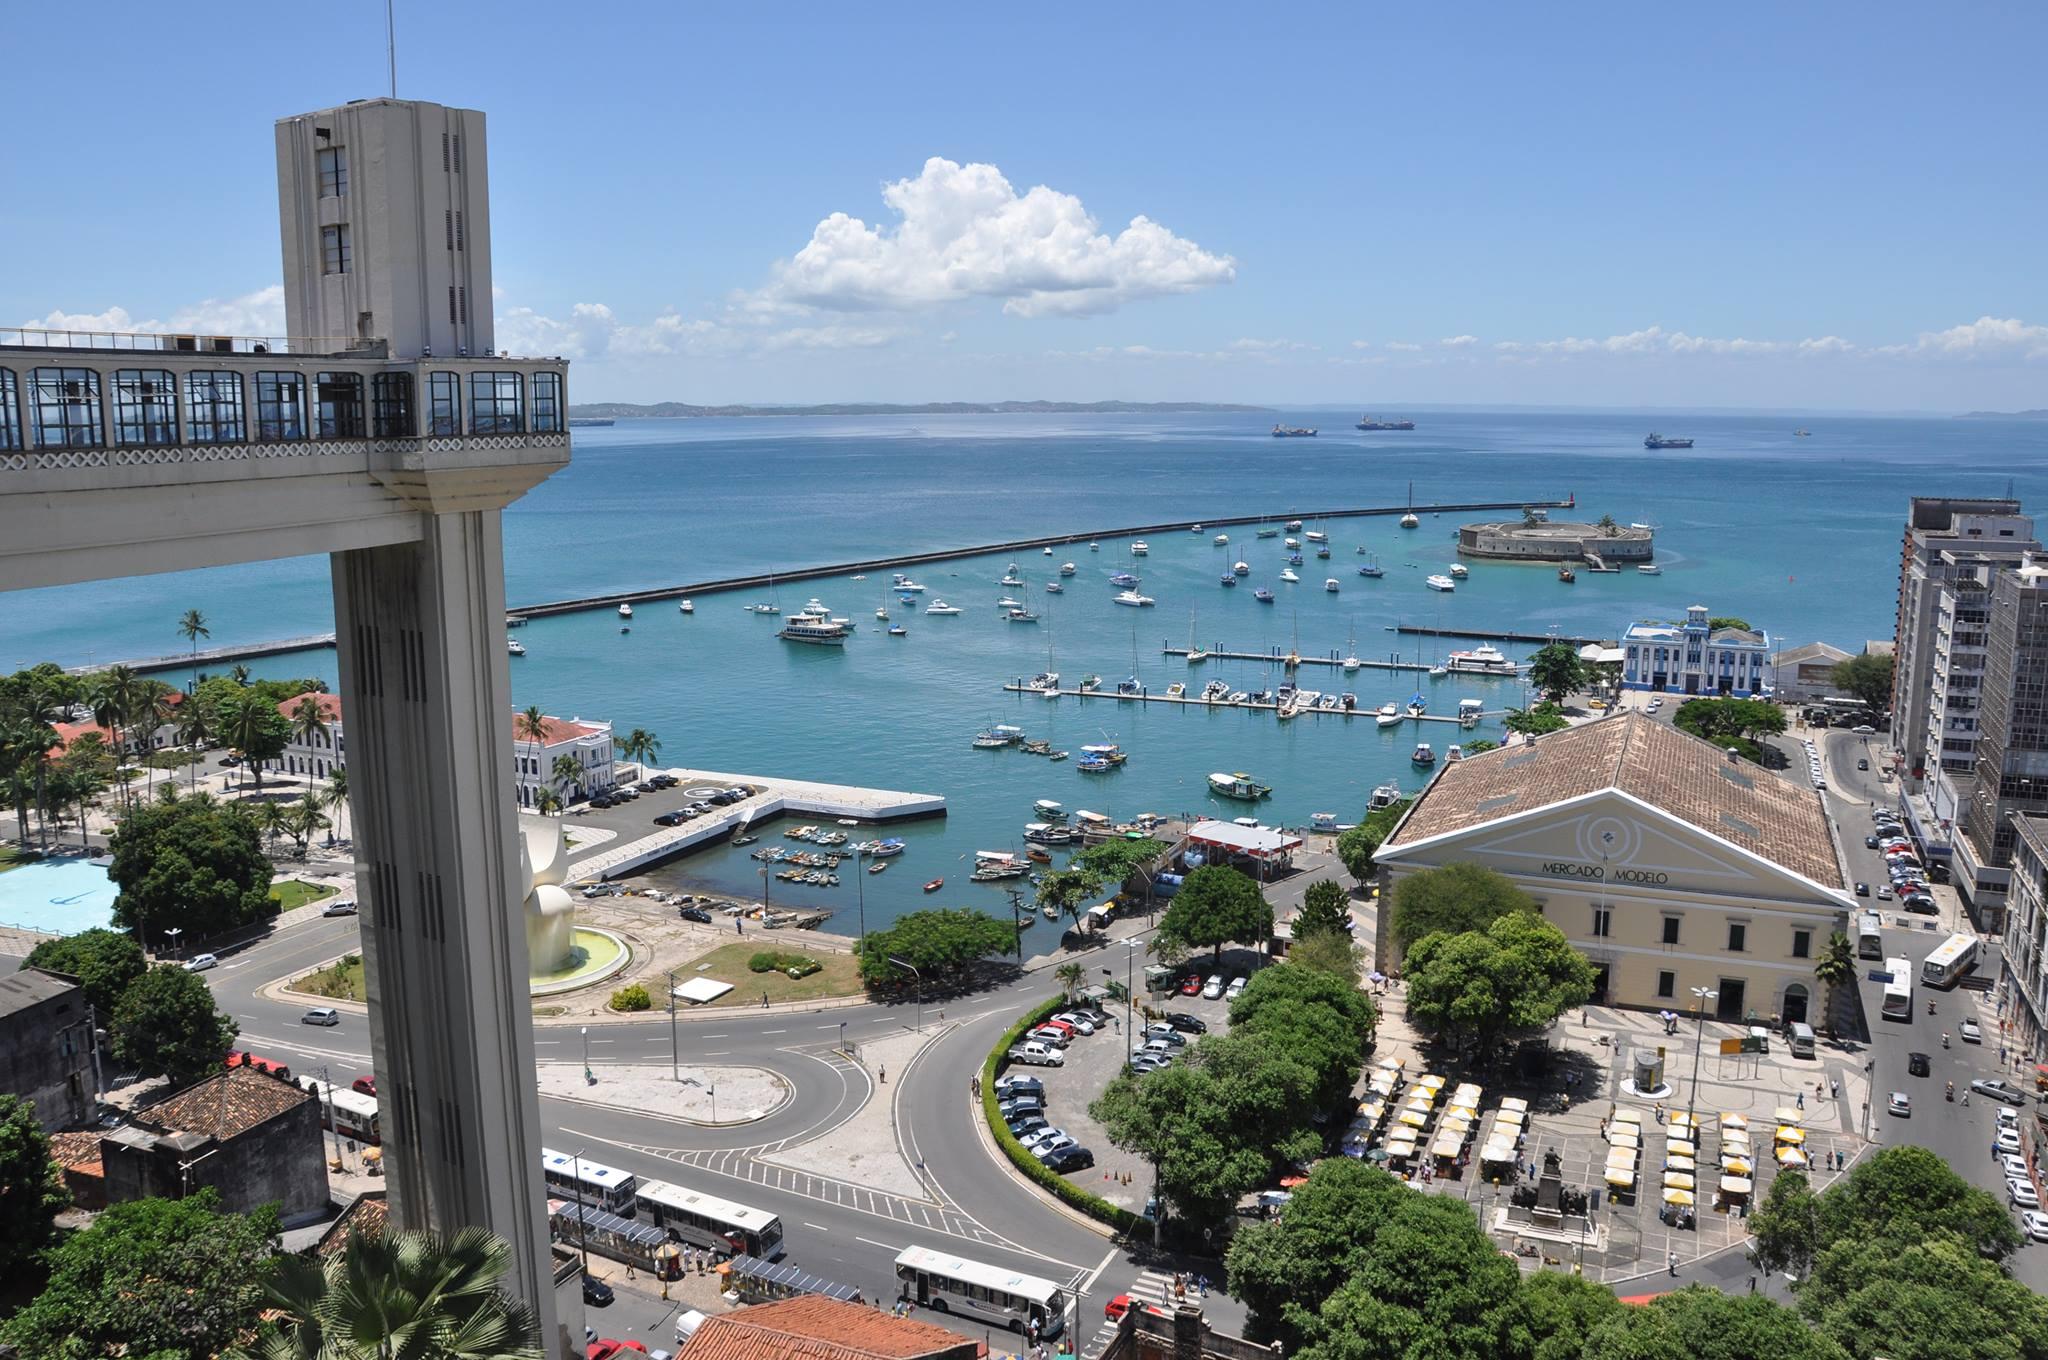 Brasilien – Urlaub in Bahia und Salvador - Urlaub_in_Bahia_und_Salvador1_171107170555_dMrjUC (1)